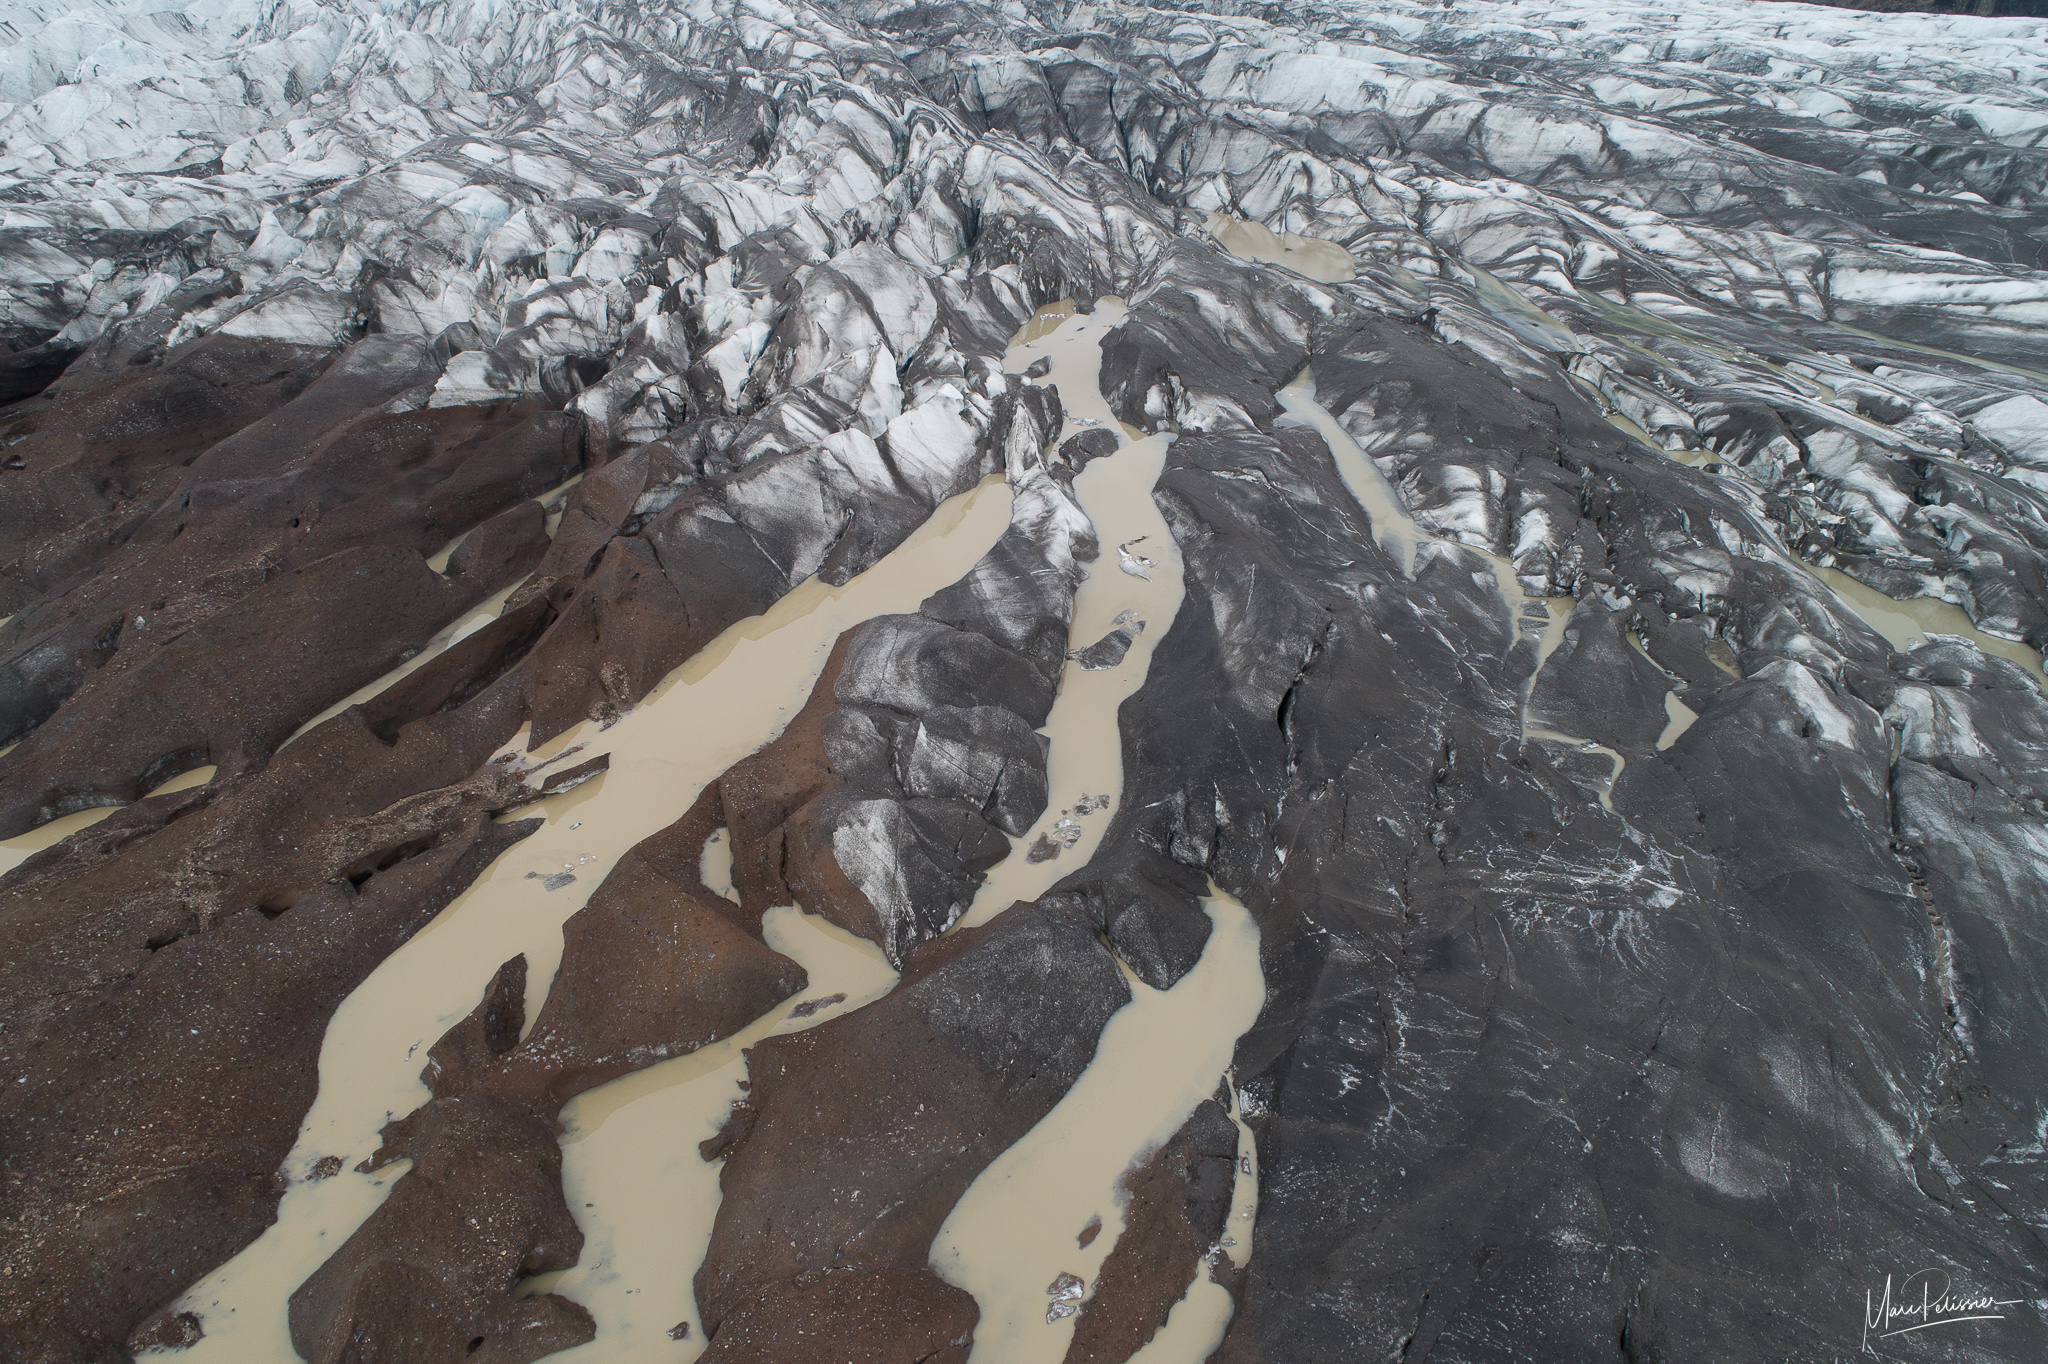 Above the Svínafellsjökull Glacier, Iceland